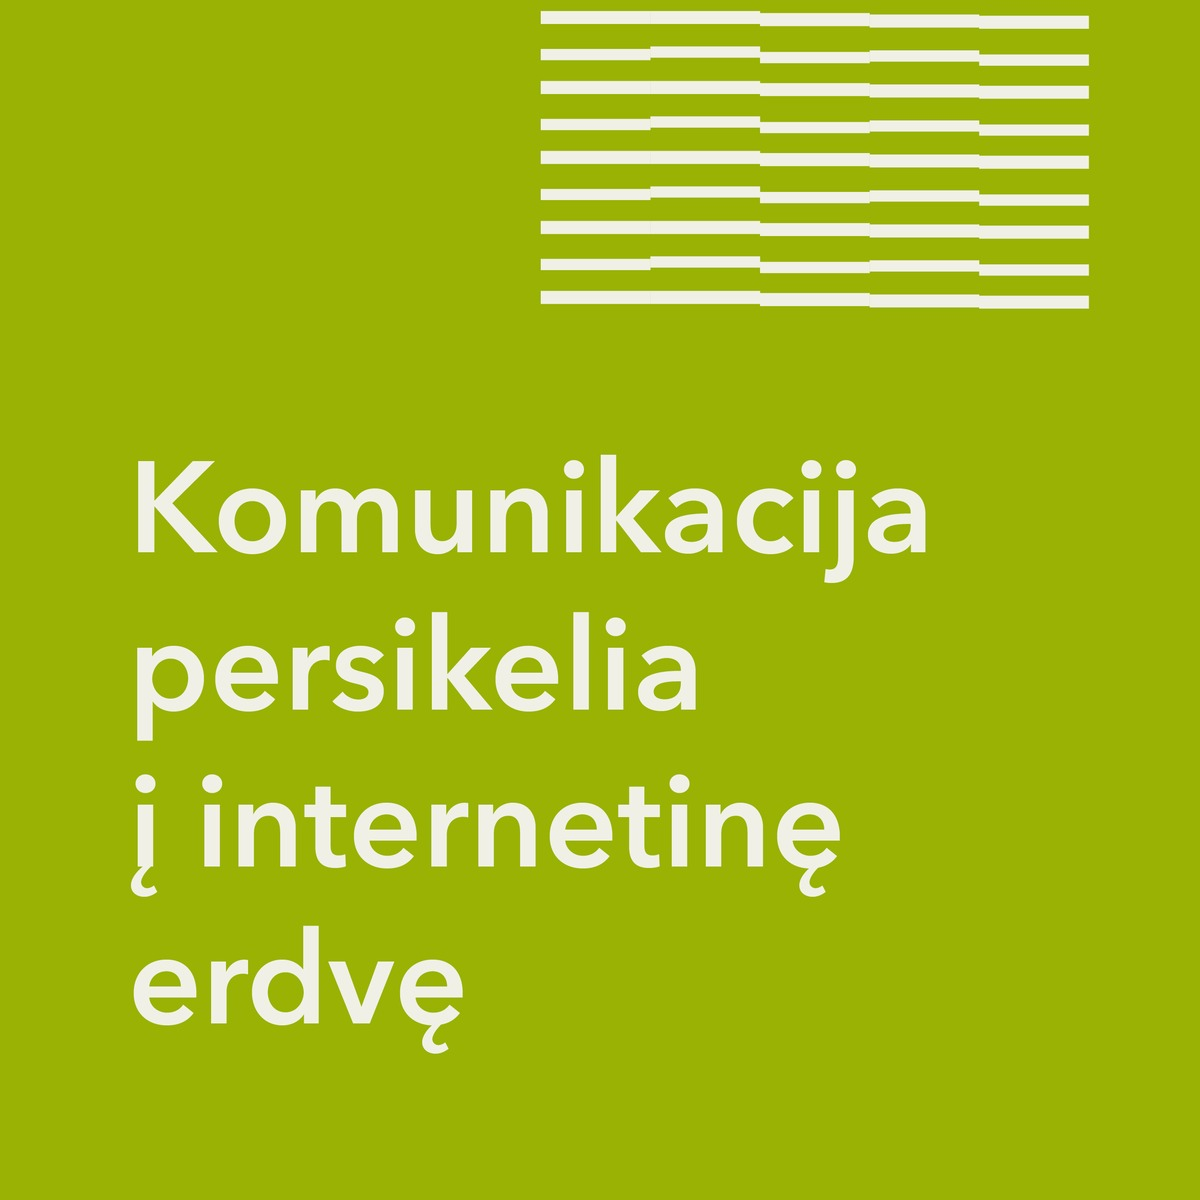 Internetinė erdvė.png